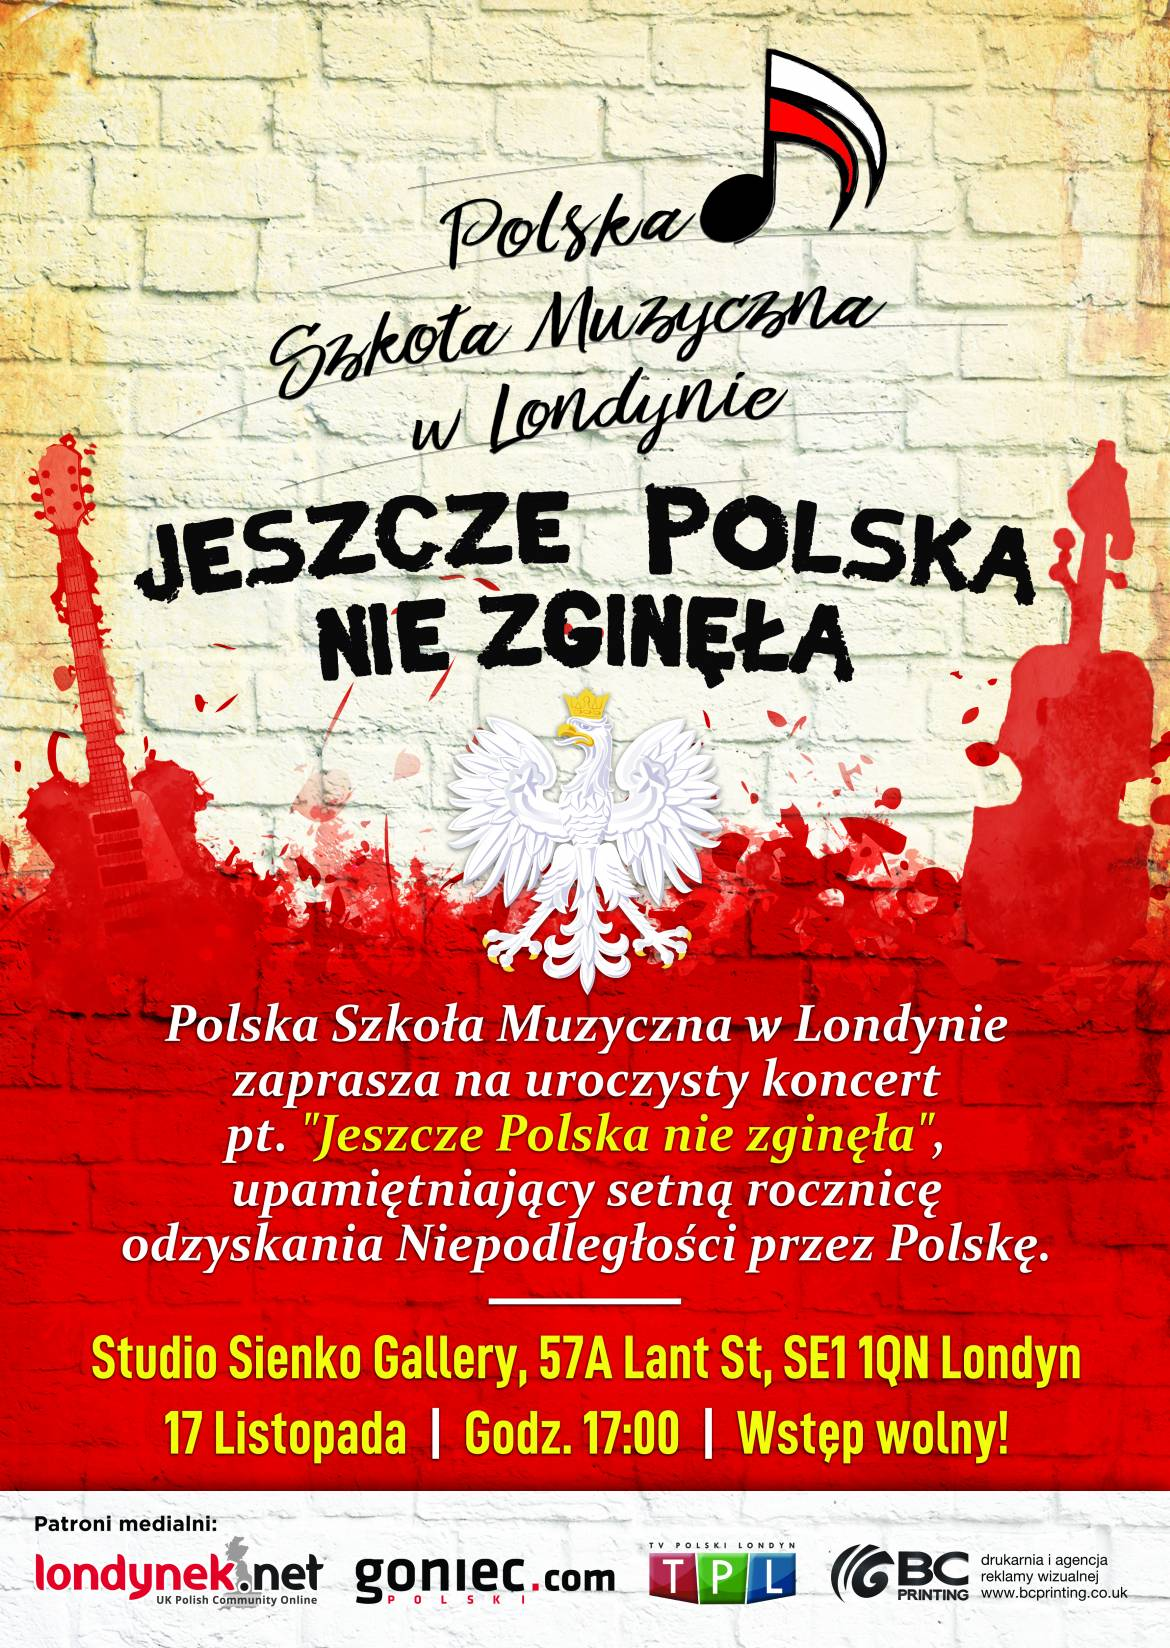 PSM-Londyn_Poster_A3_2018-09-17_005.jpg